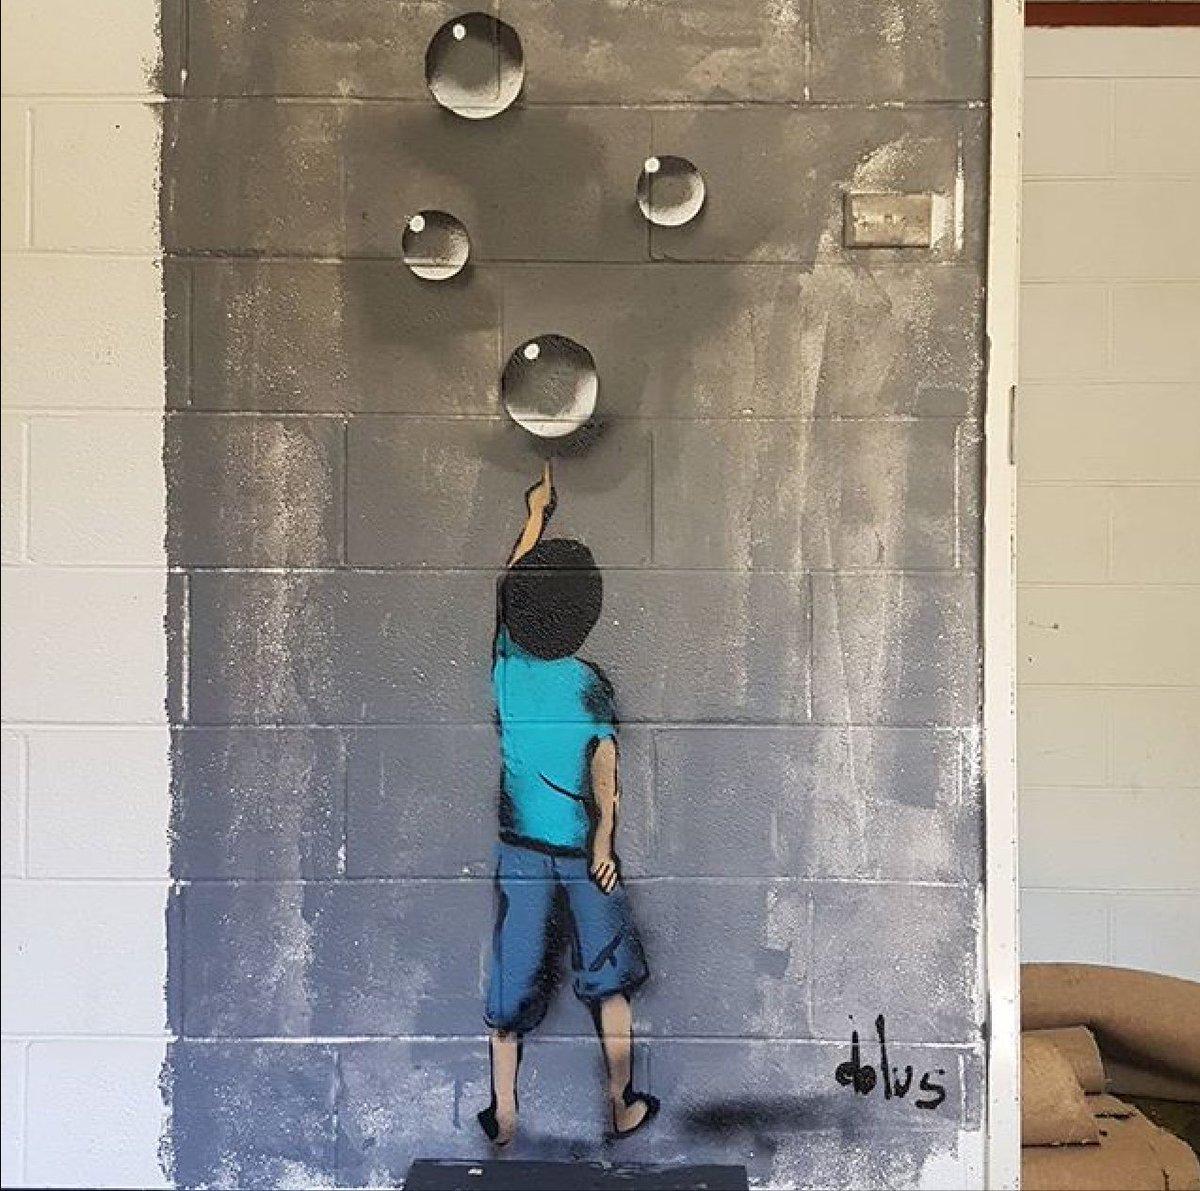 New Street Art by Dolus   #streetart #art #arte